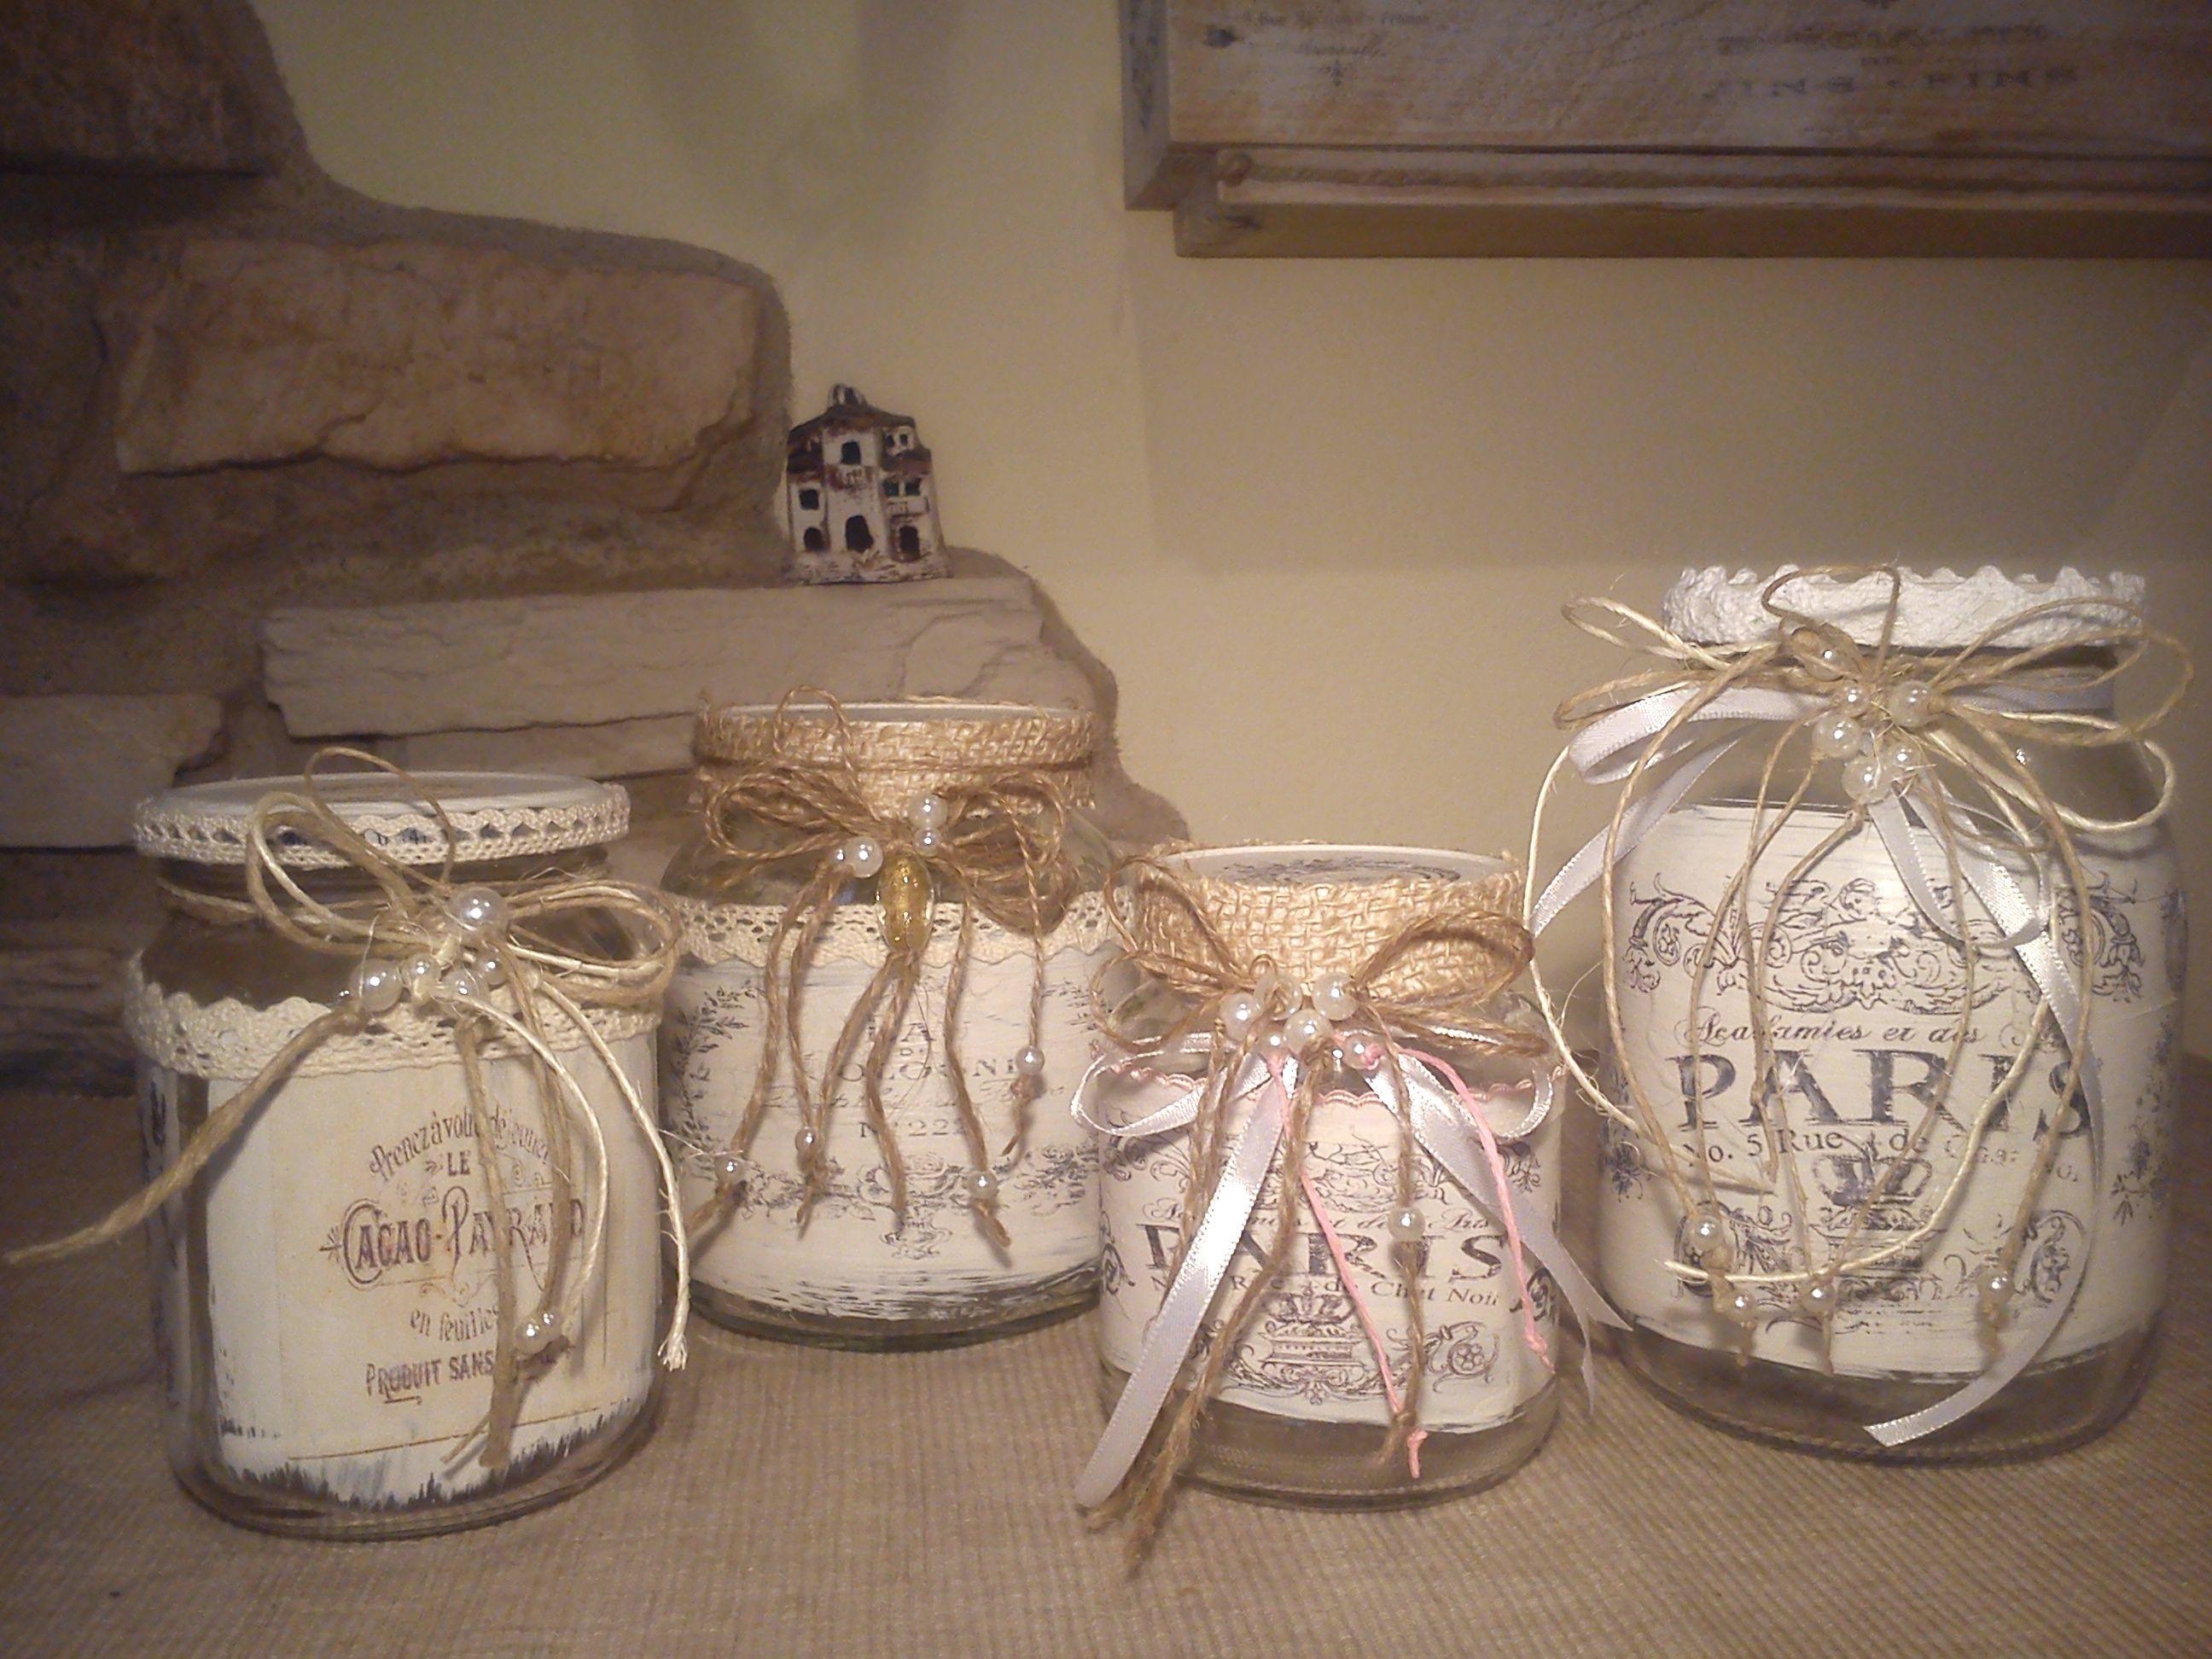 Vasetti riciclati in vetro e decorati in stile shabby chic - Vasetti vetro decorati ...